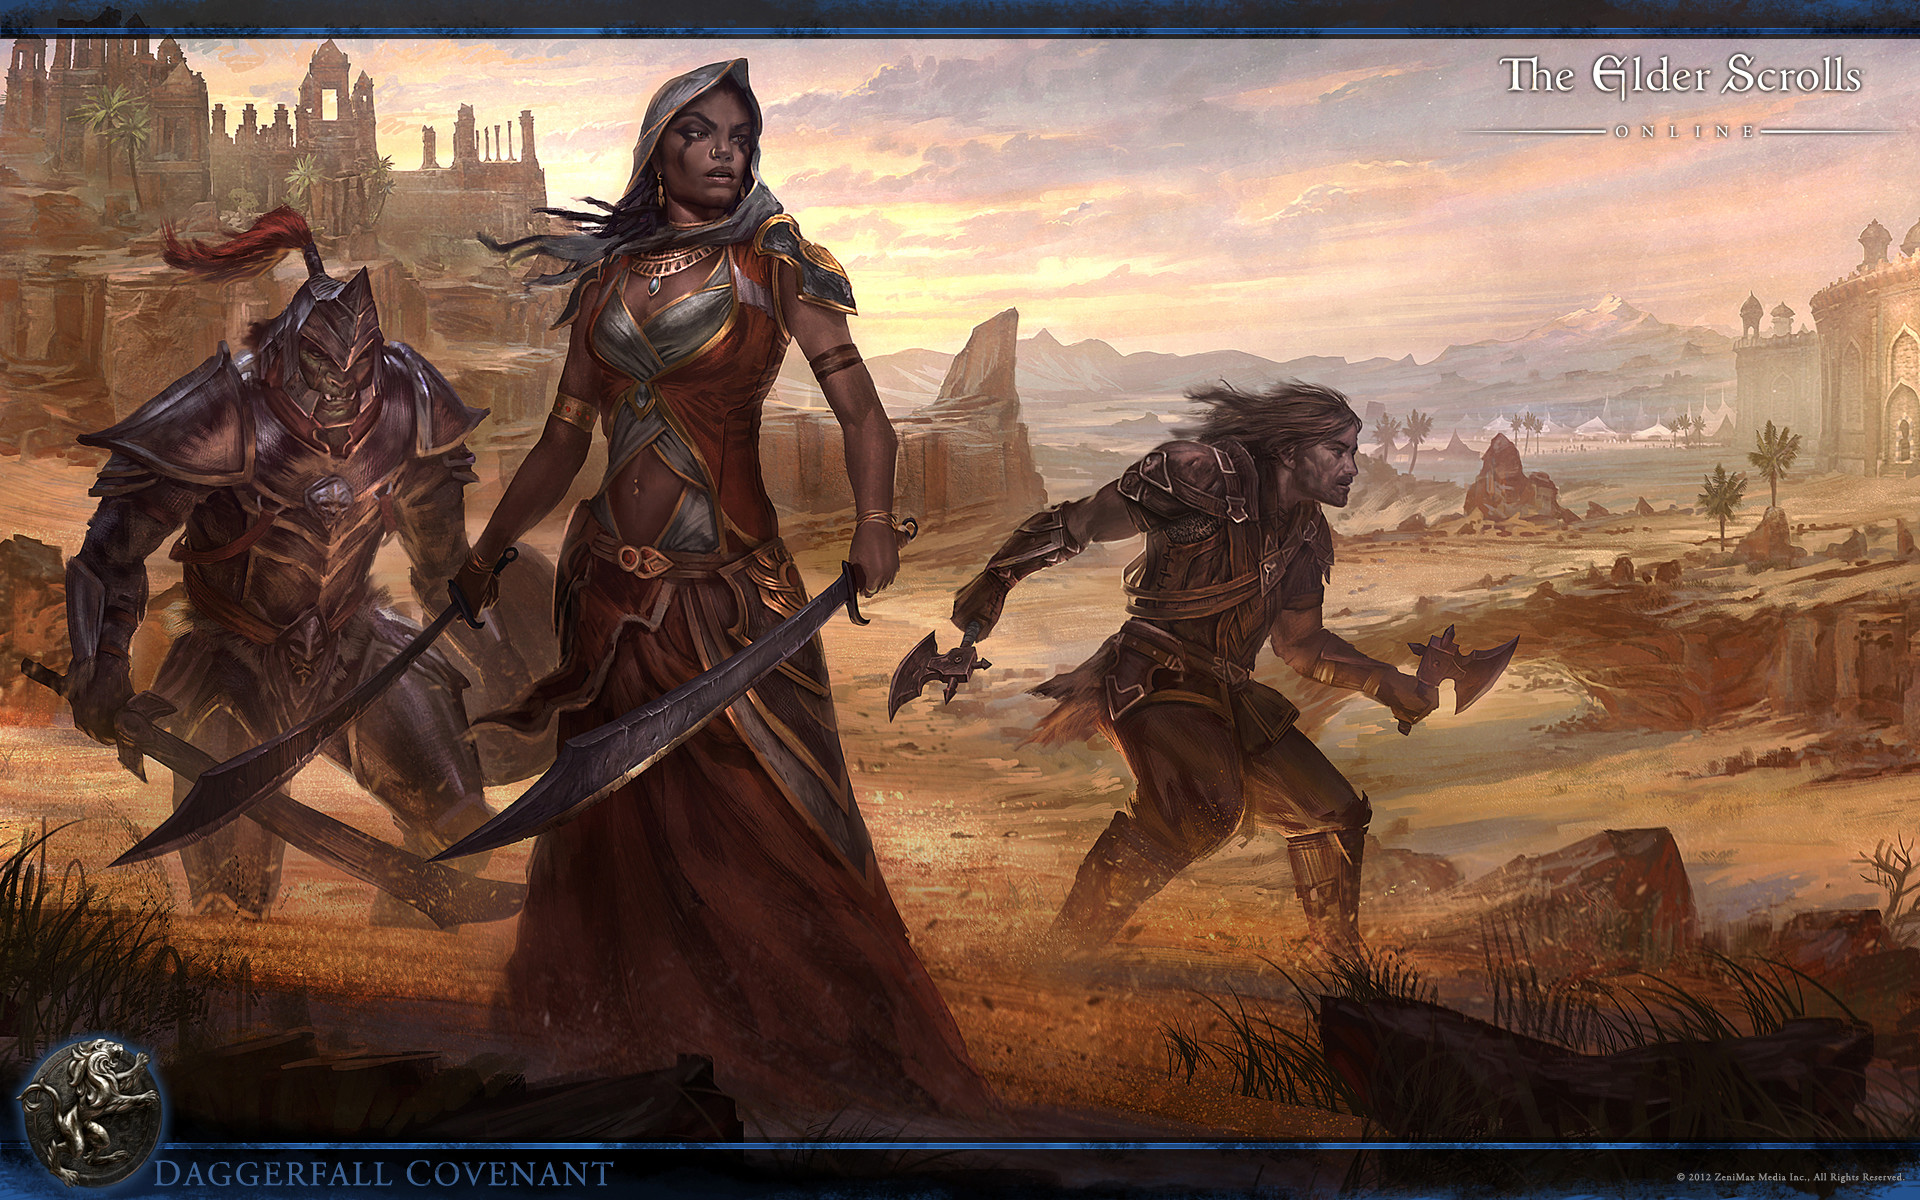 The Elder Scrolls Online Wallpapers HD Wallpapers 1920×1200